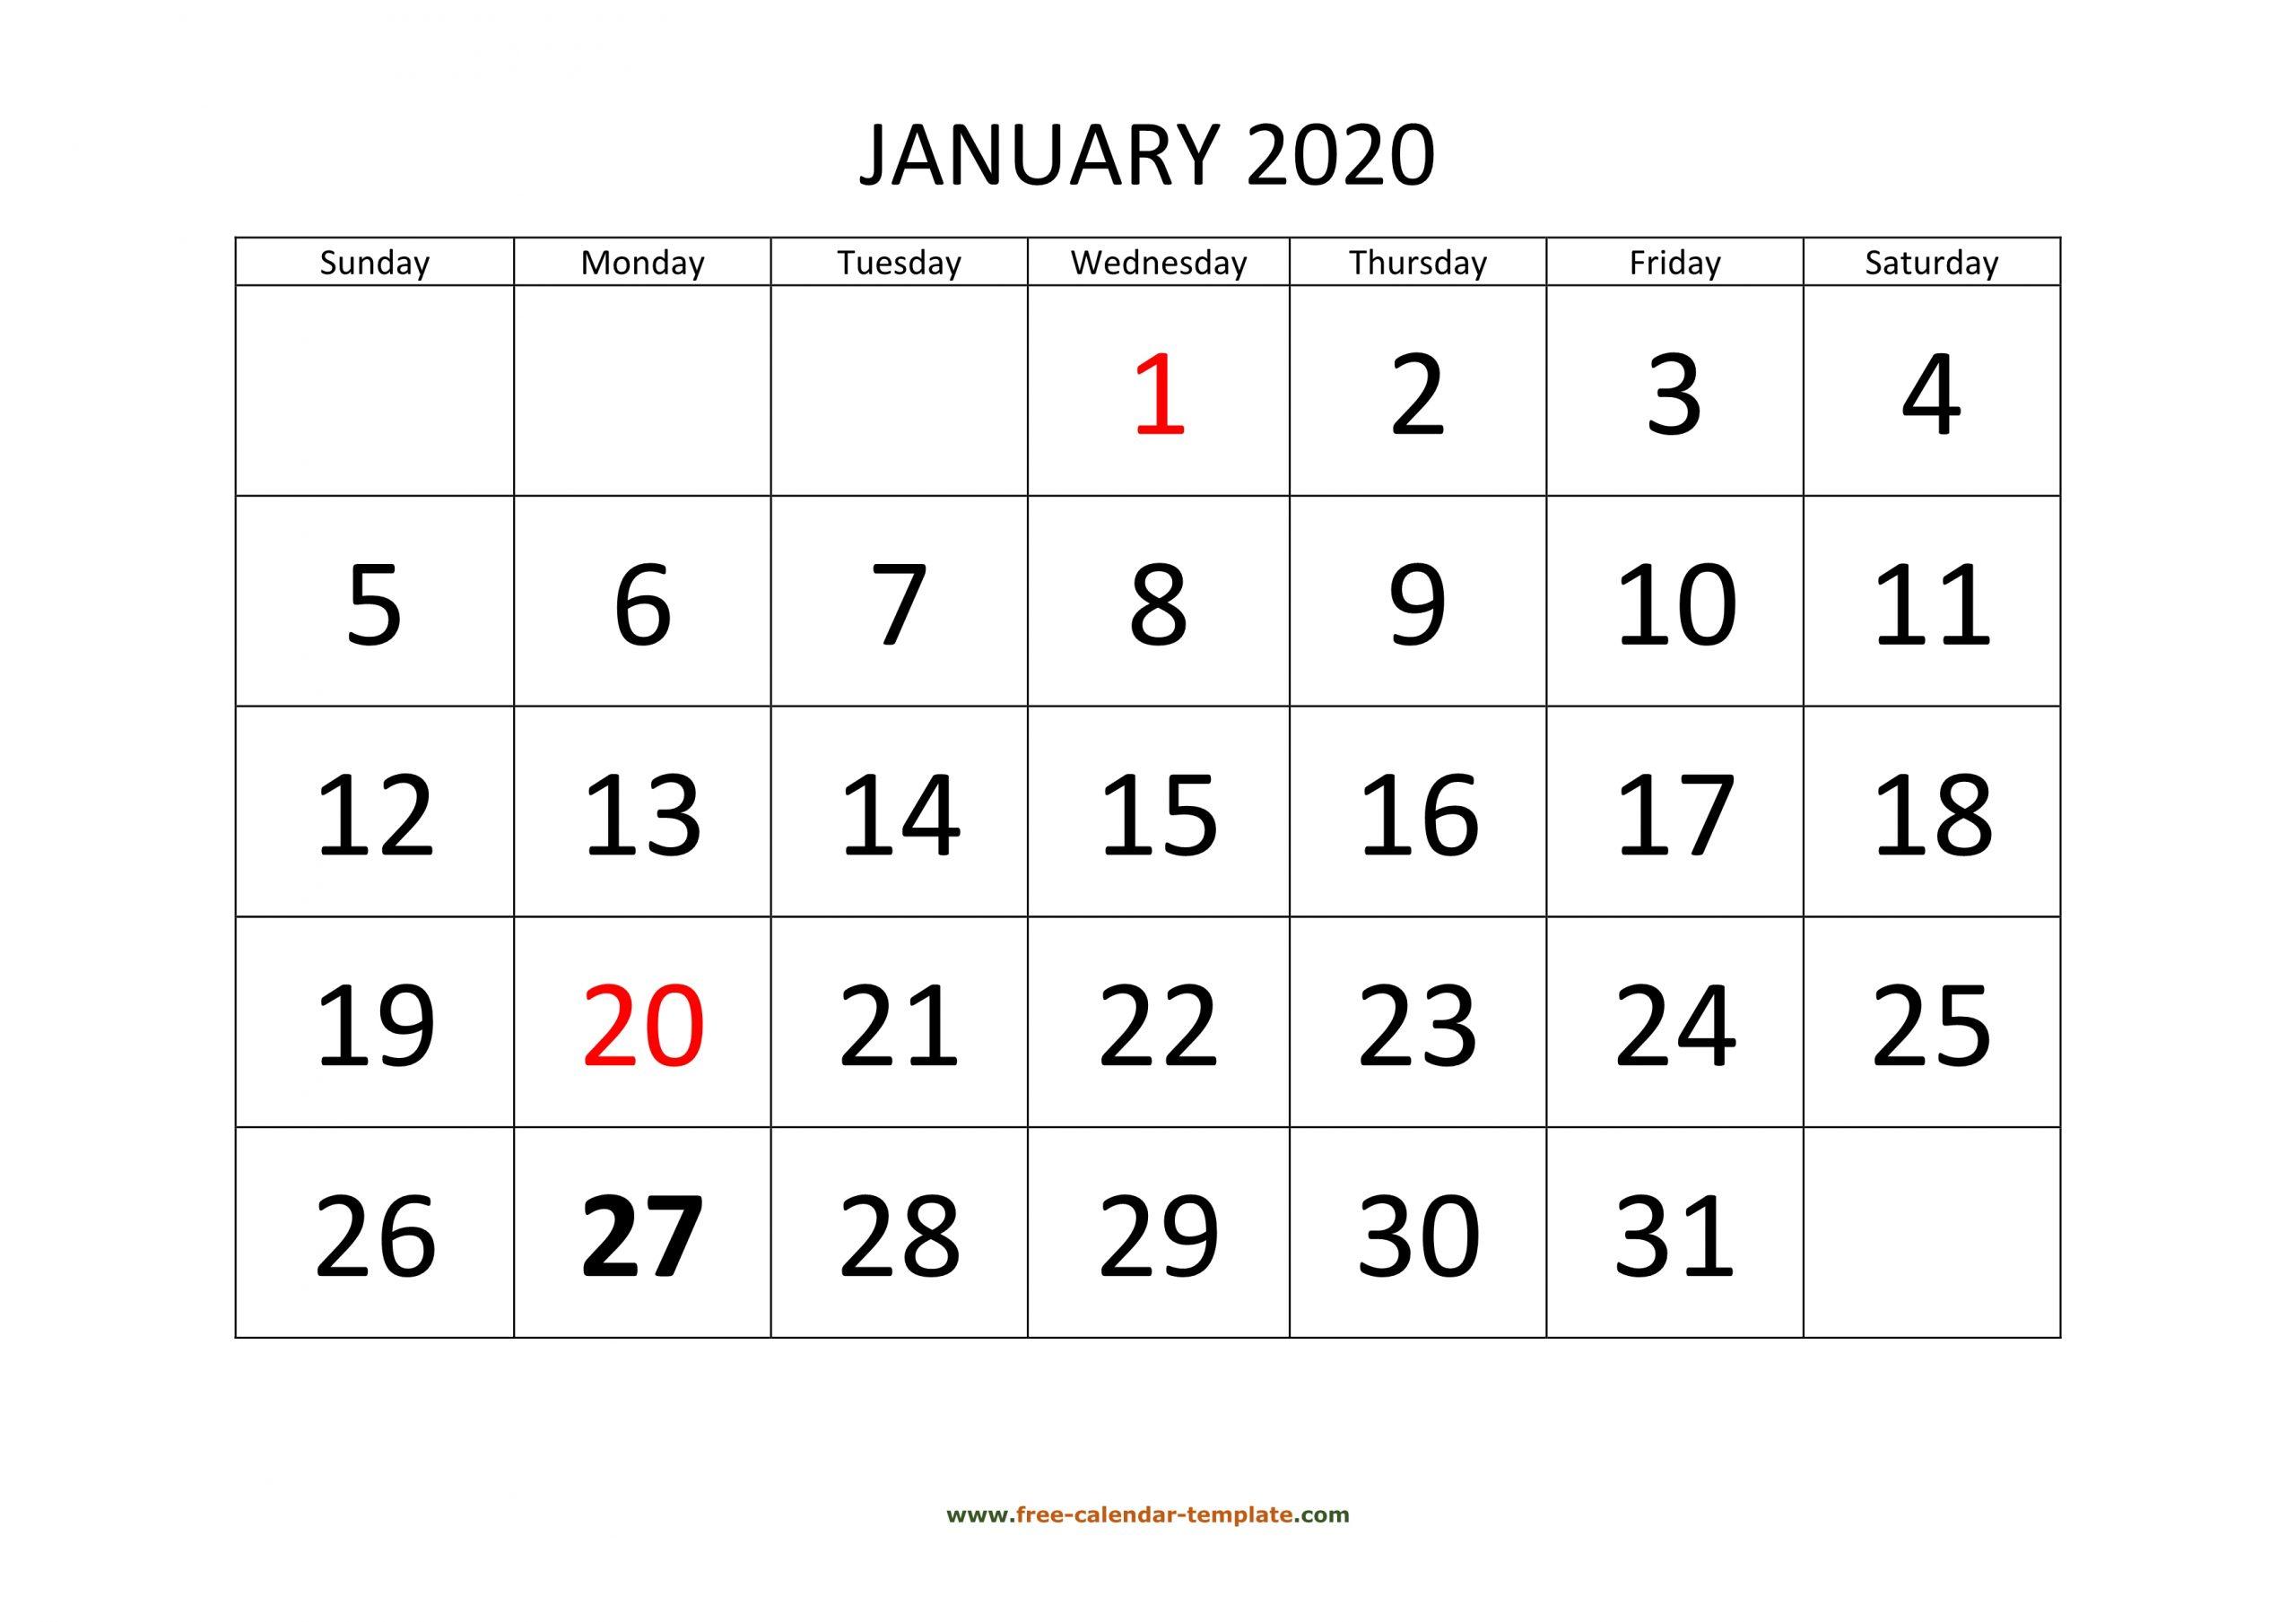 January 2020 Free Calendar Tempplate | Free-Calendar